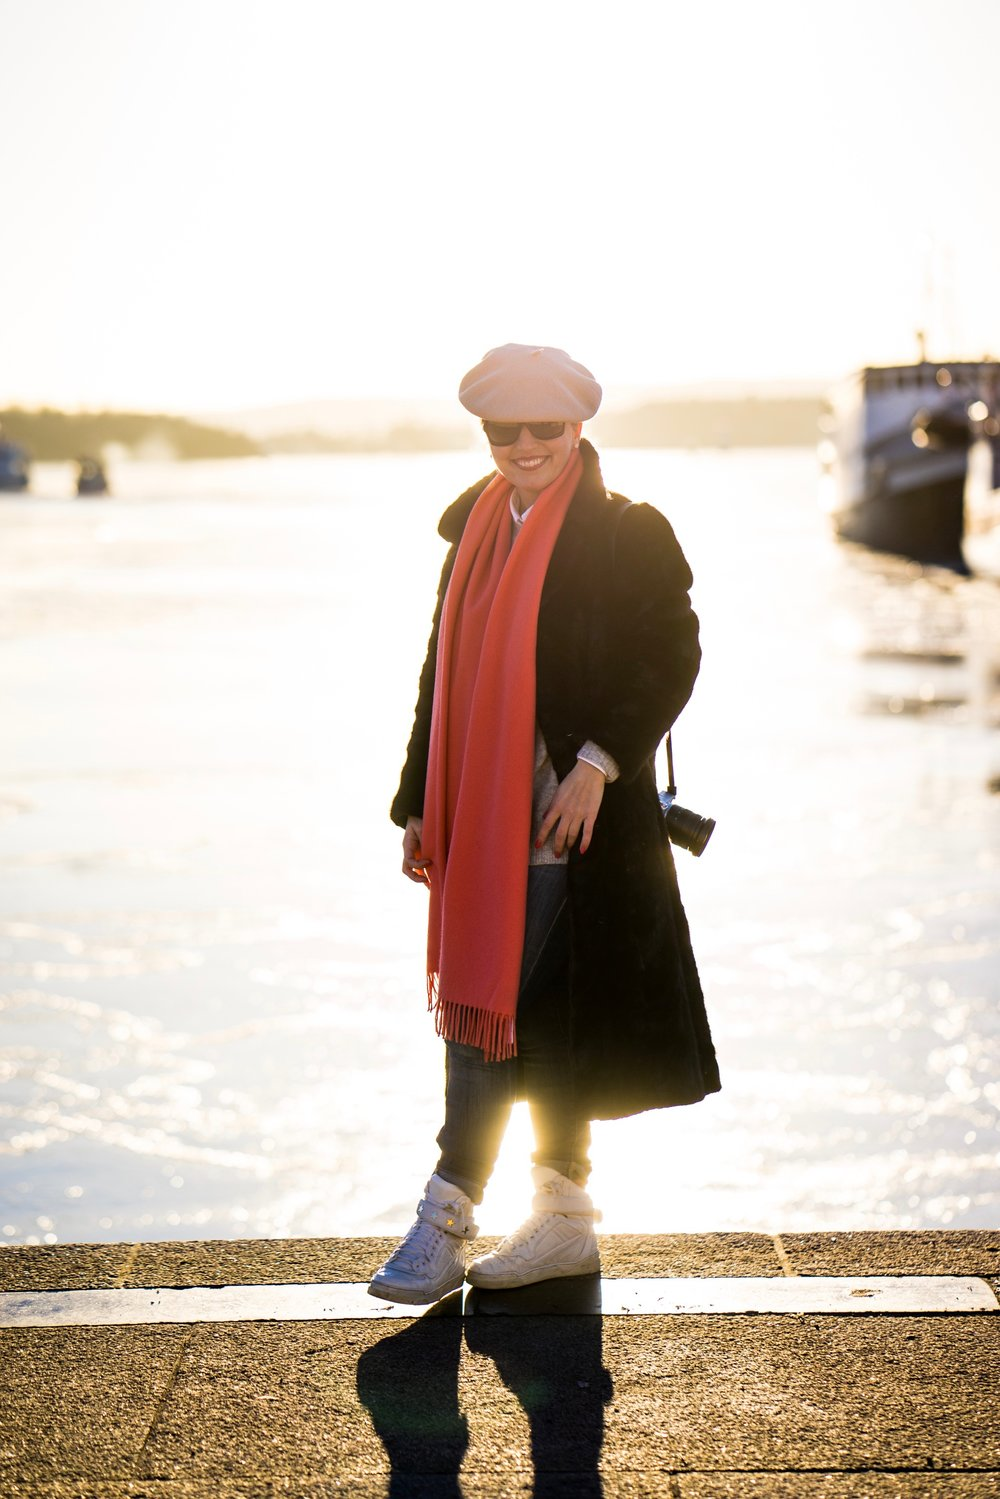 AKERBRYGGE • OSLO, NORWAY PHOTOGRAPHER: MOHAMMAD ATAEY